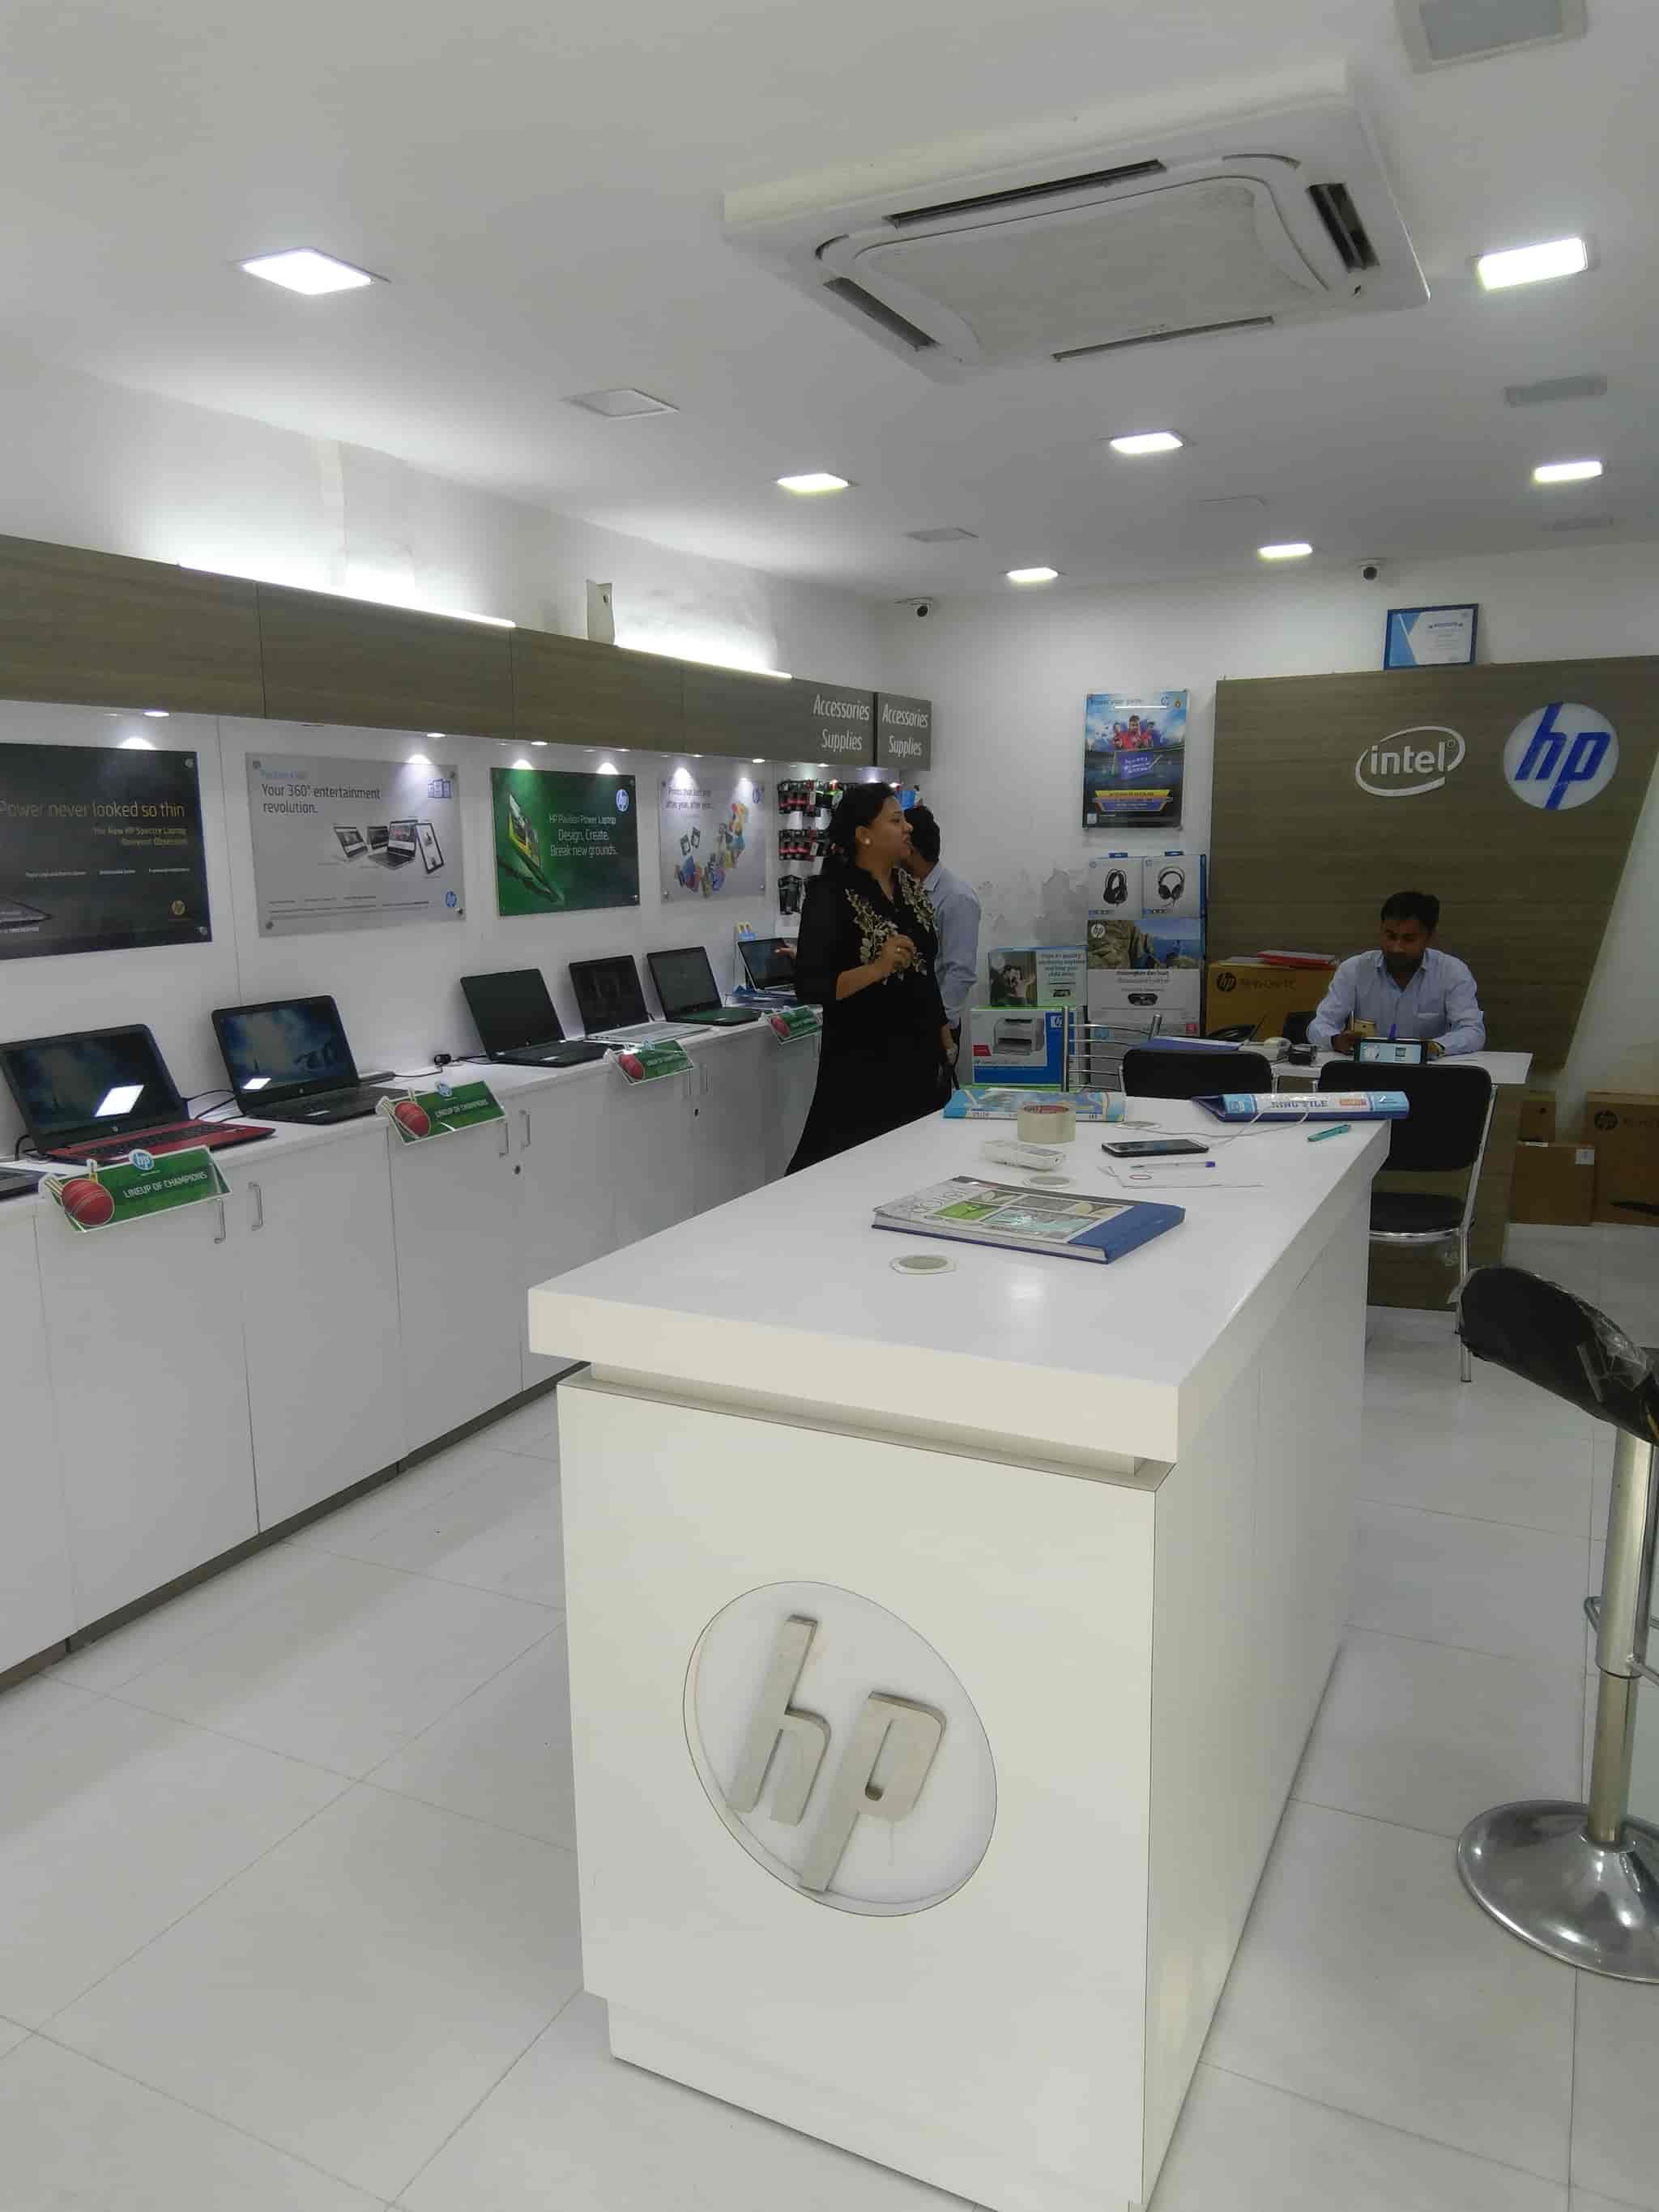 HP World, Pitampura - Laptop Dealers in Delhi - Justdial